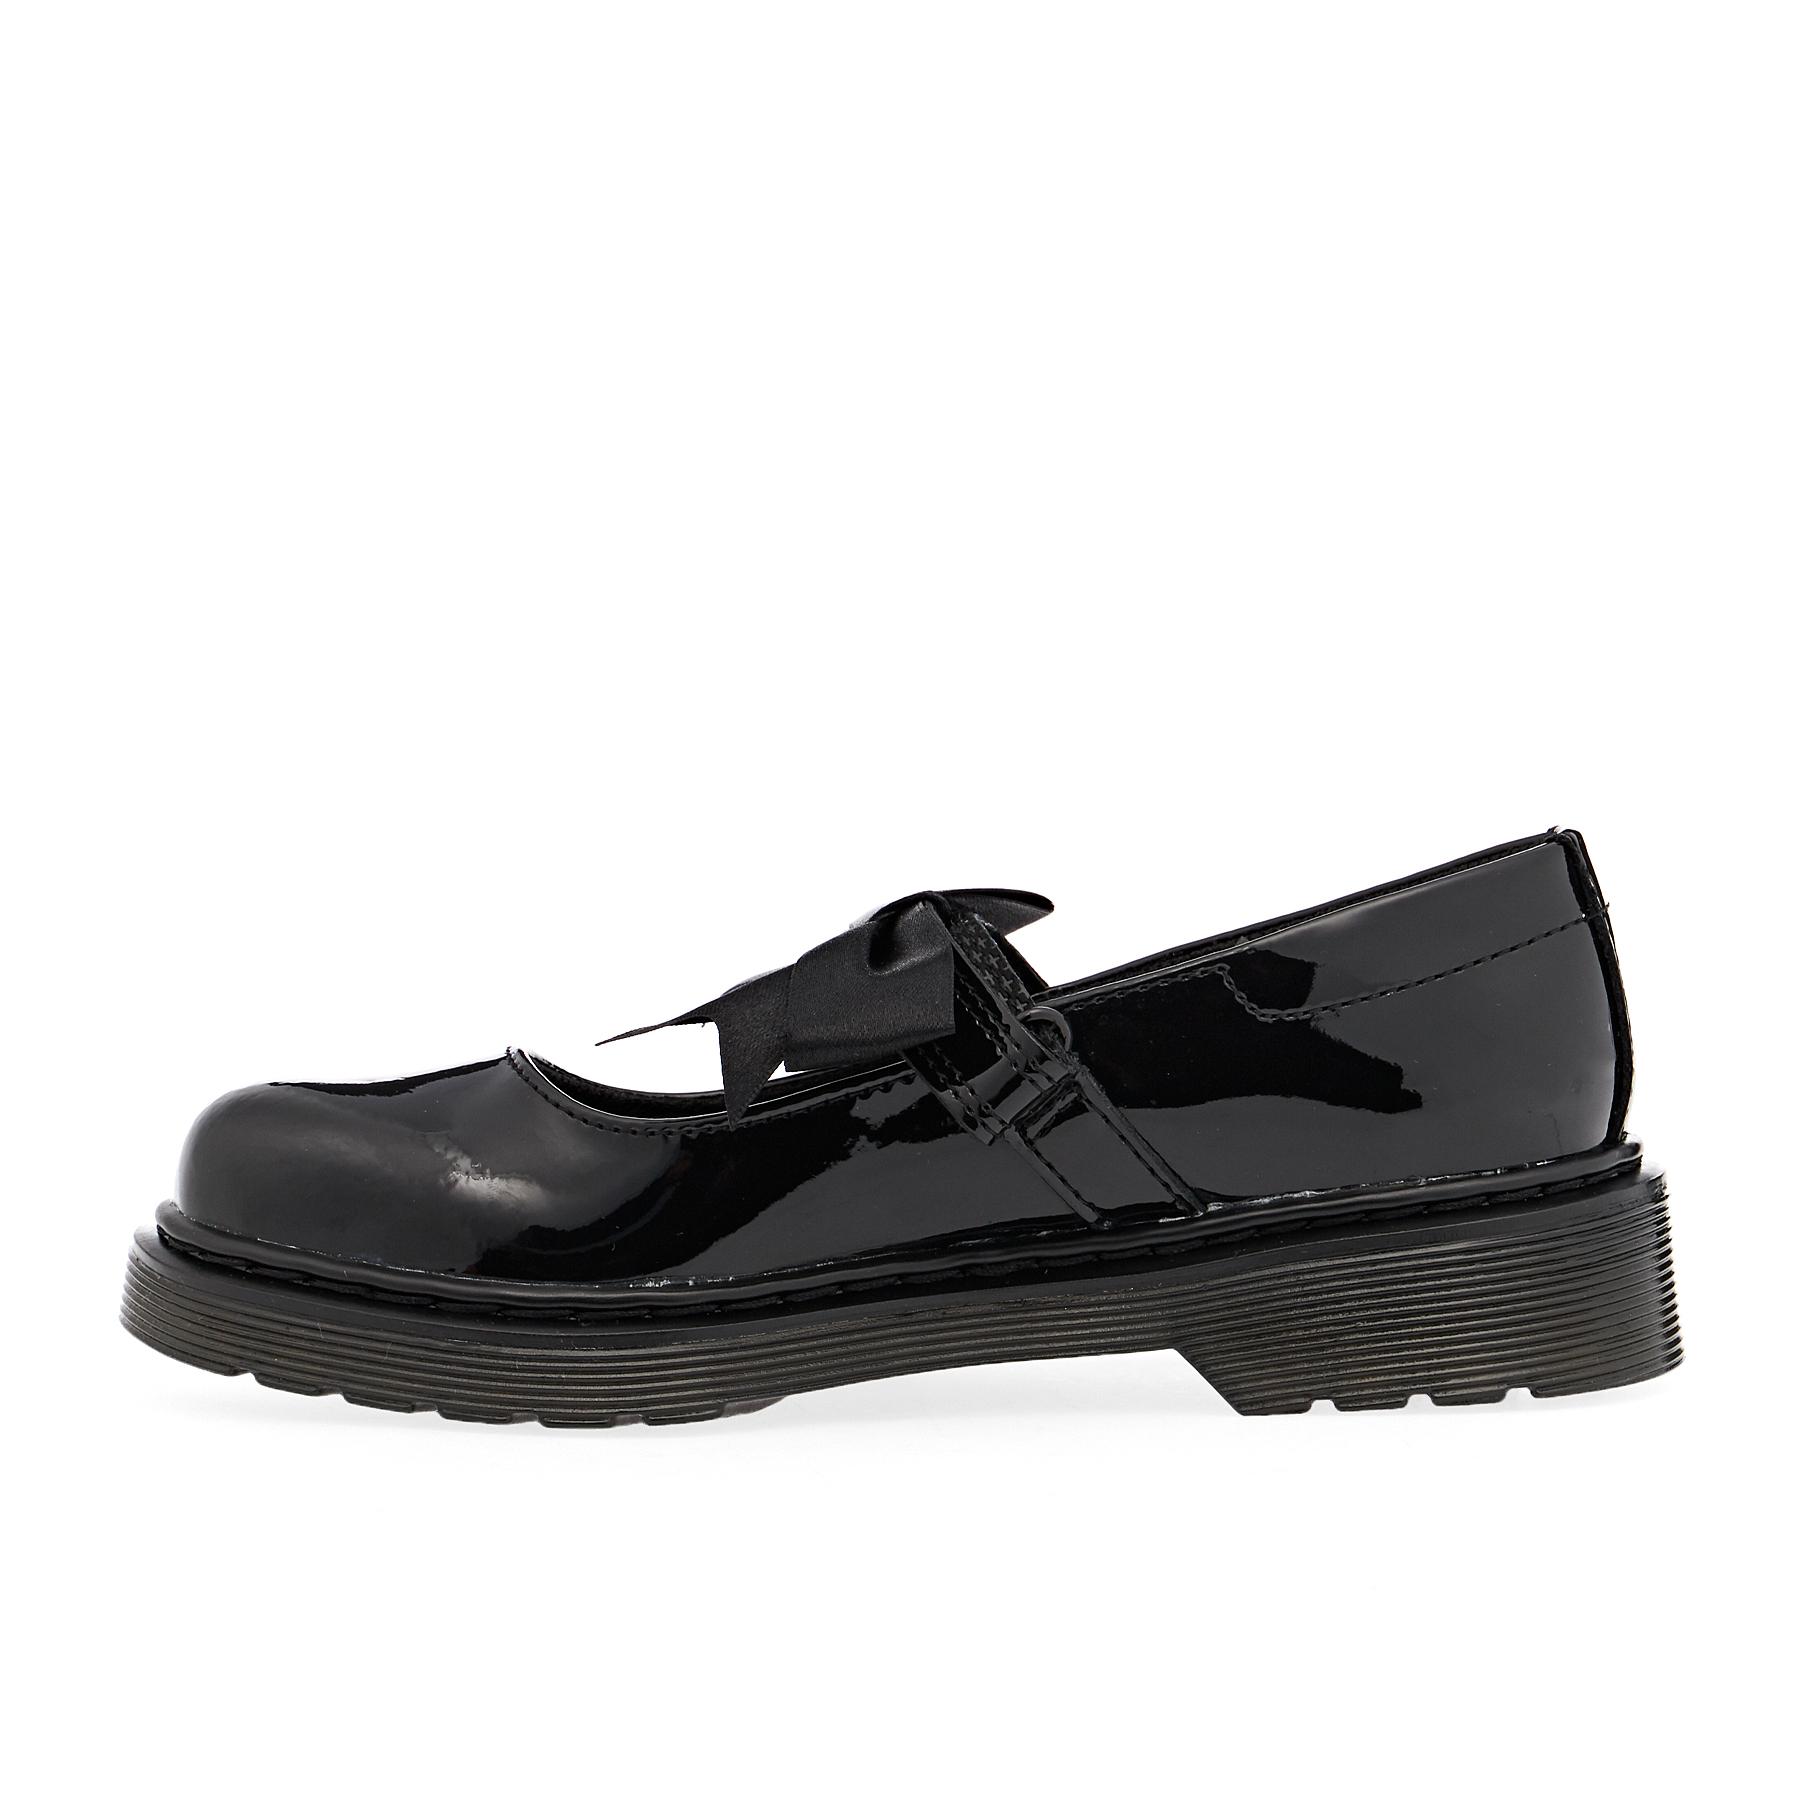 Dr Martens Maccy II Junior Kid's Shoes